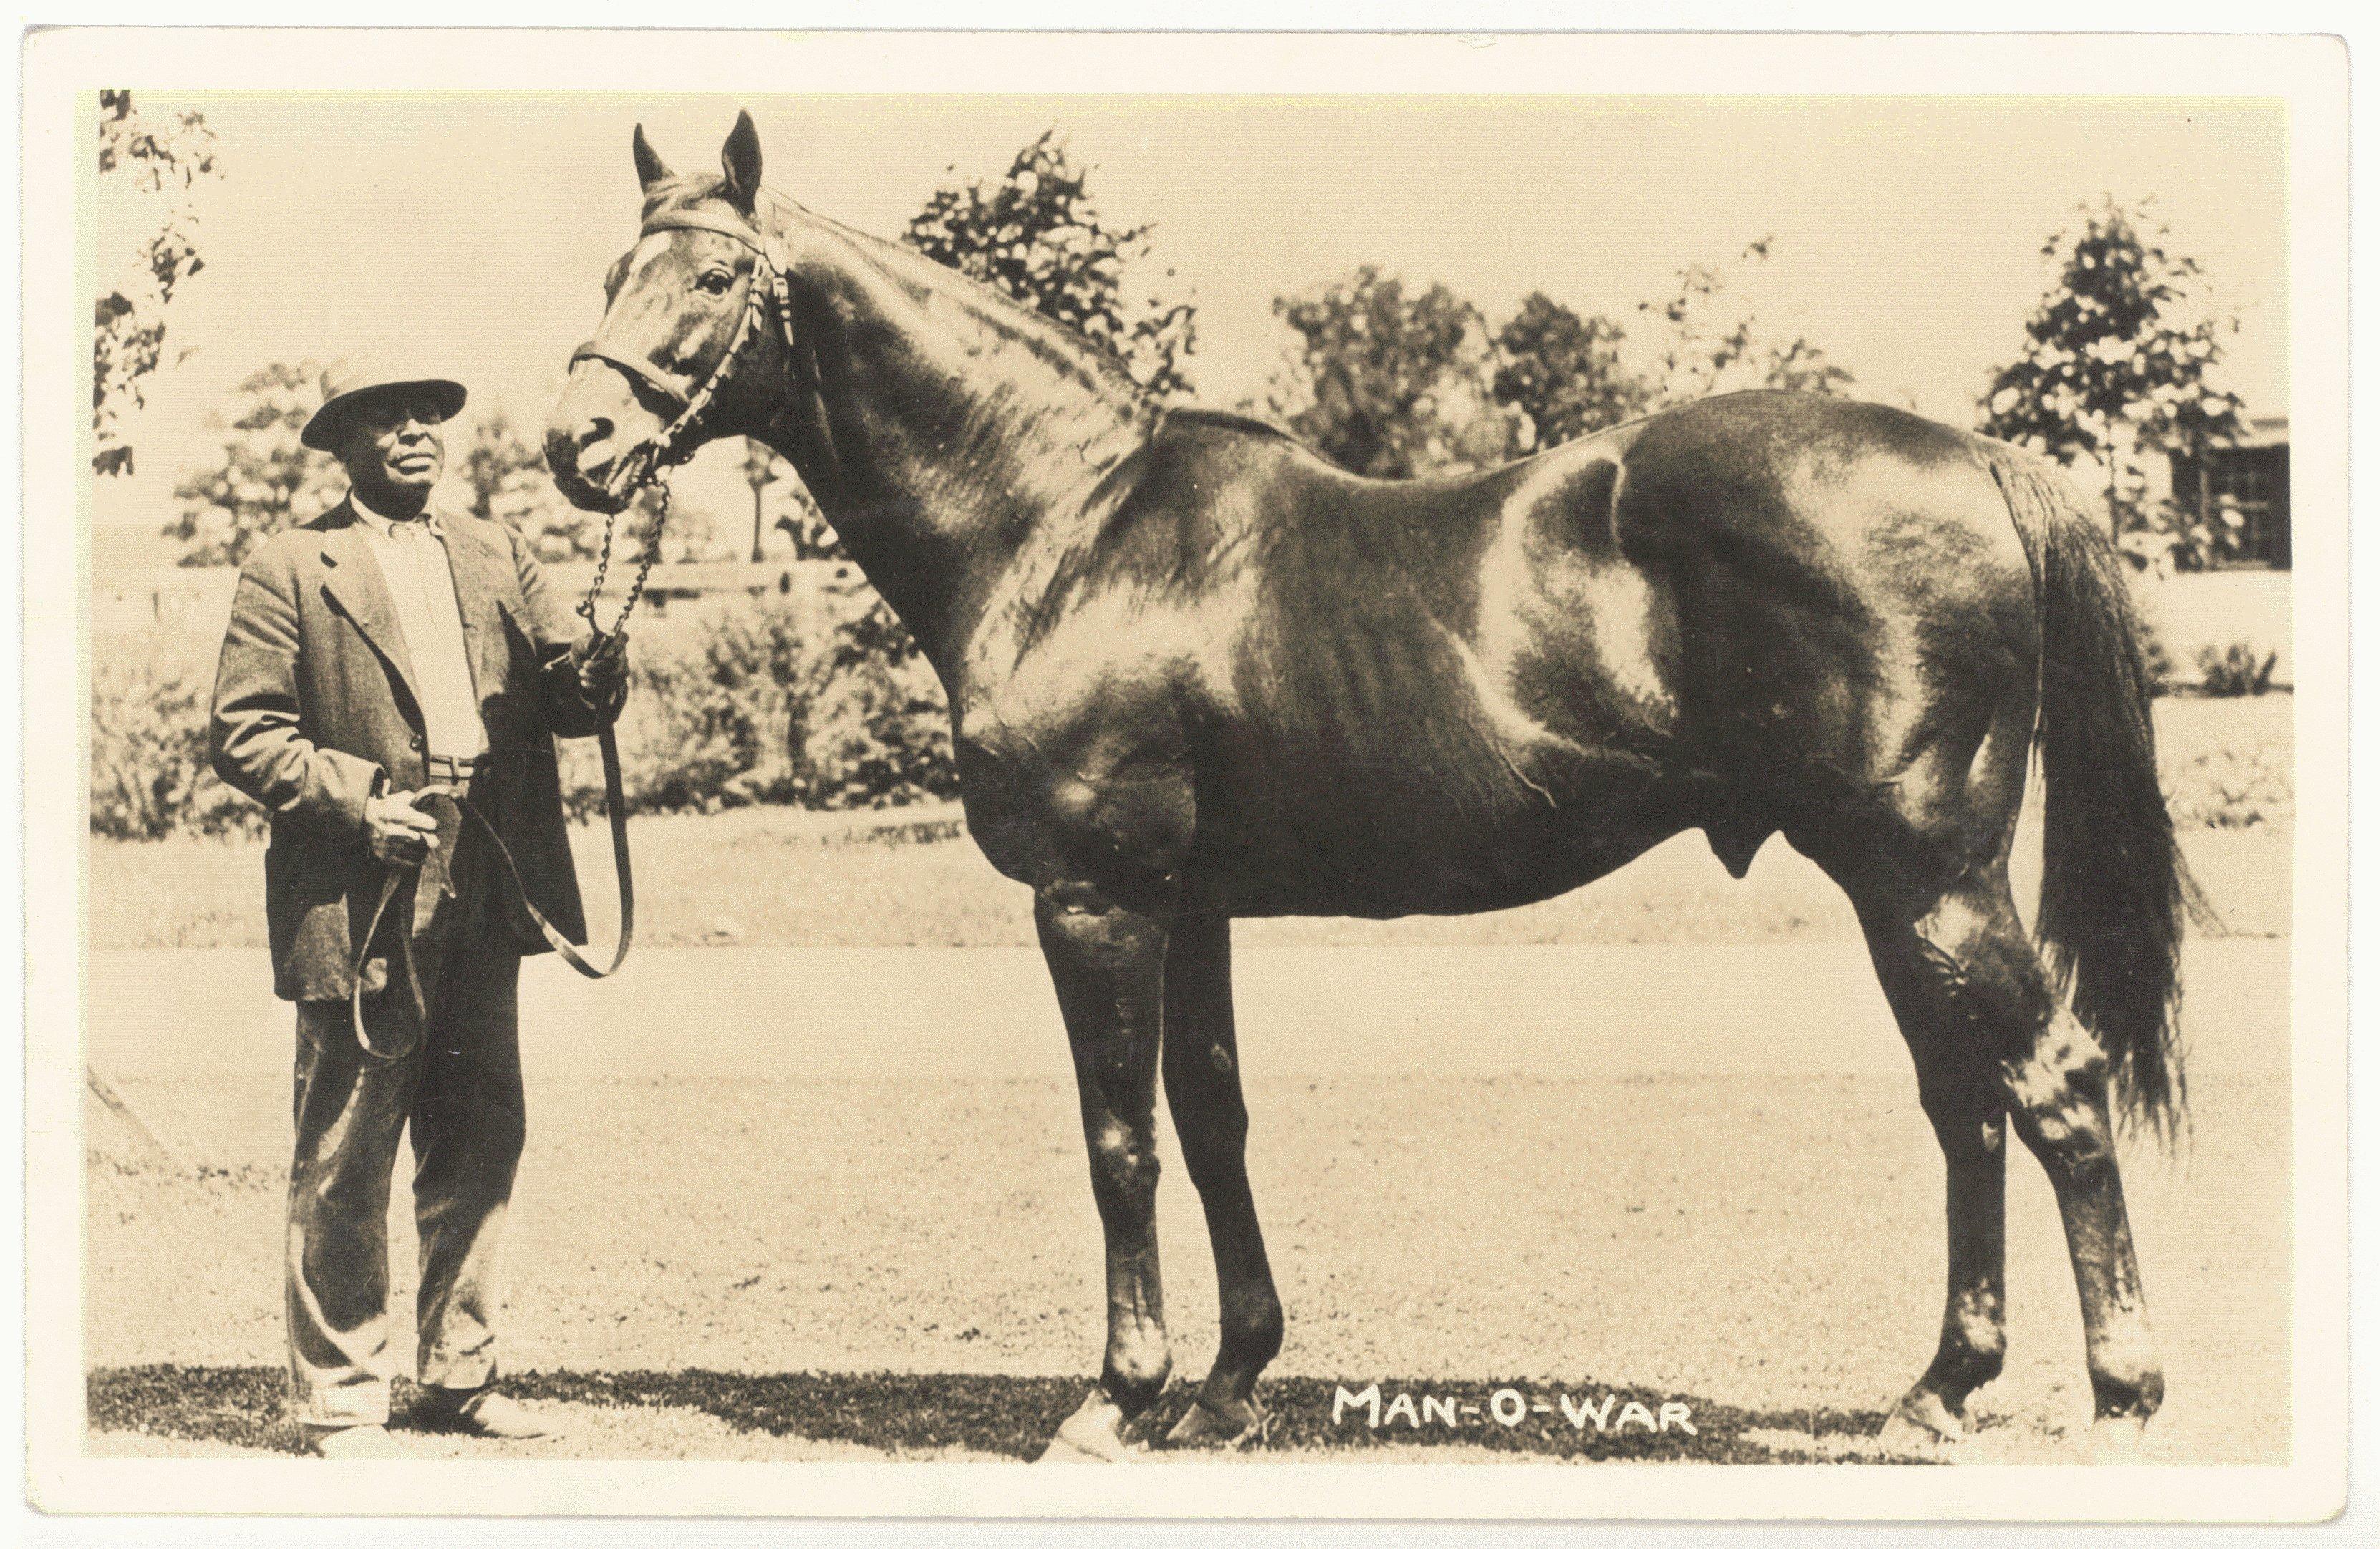 Kentucky horse park clipart vector stock Man o\'War Turned 100 and the Kentucky Horse Park is Having a Party vector stock